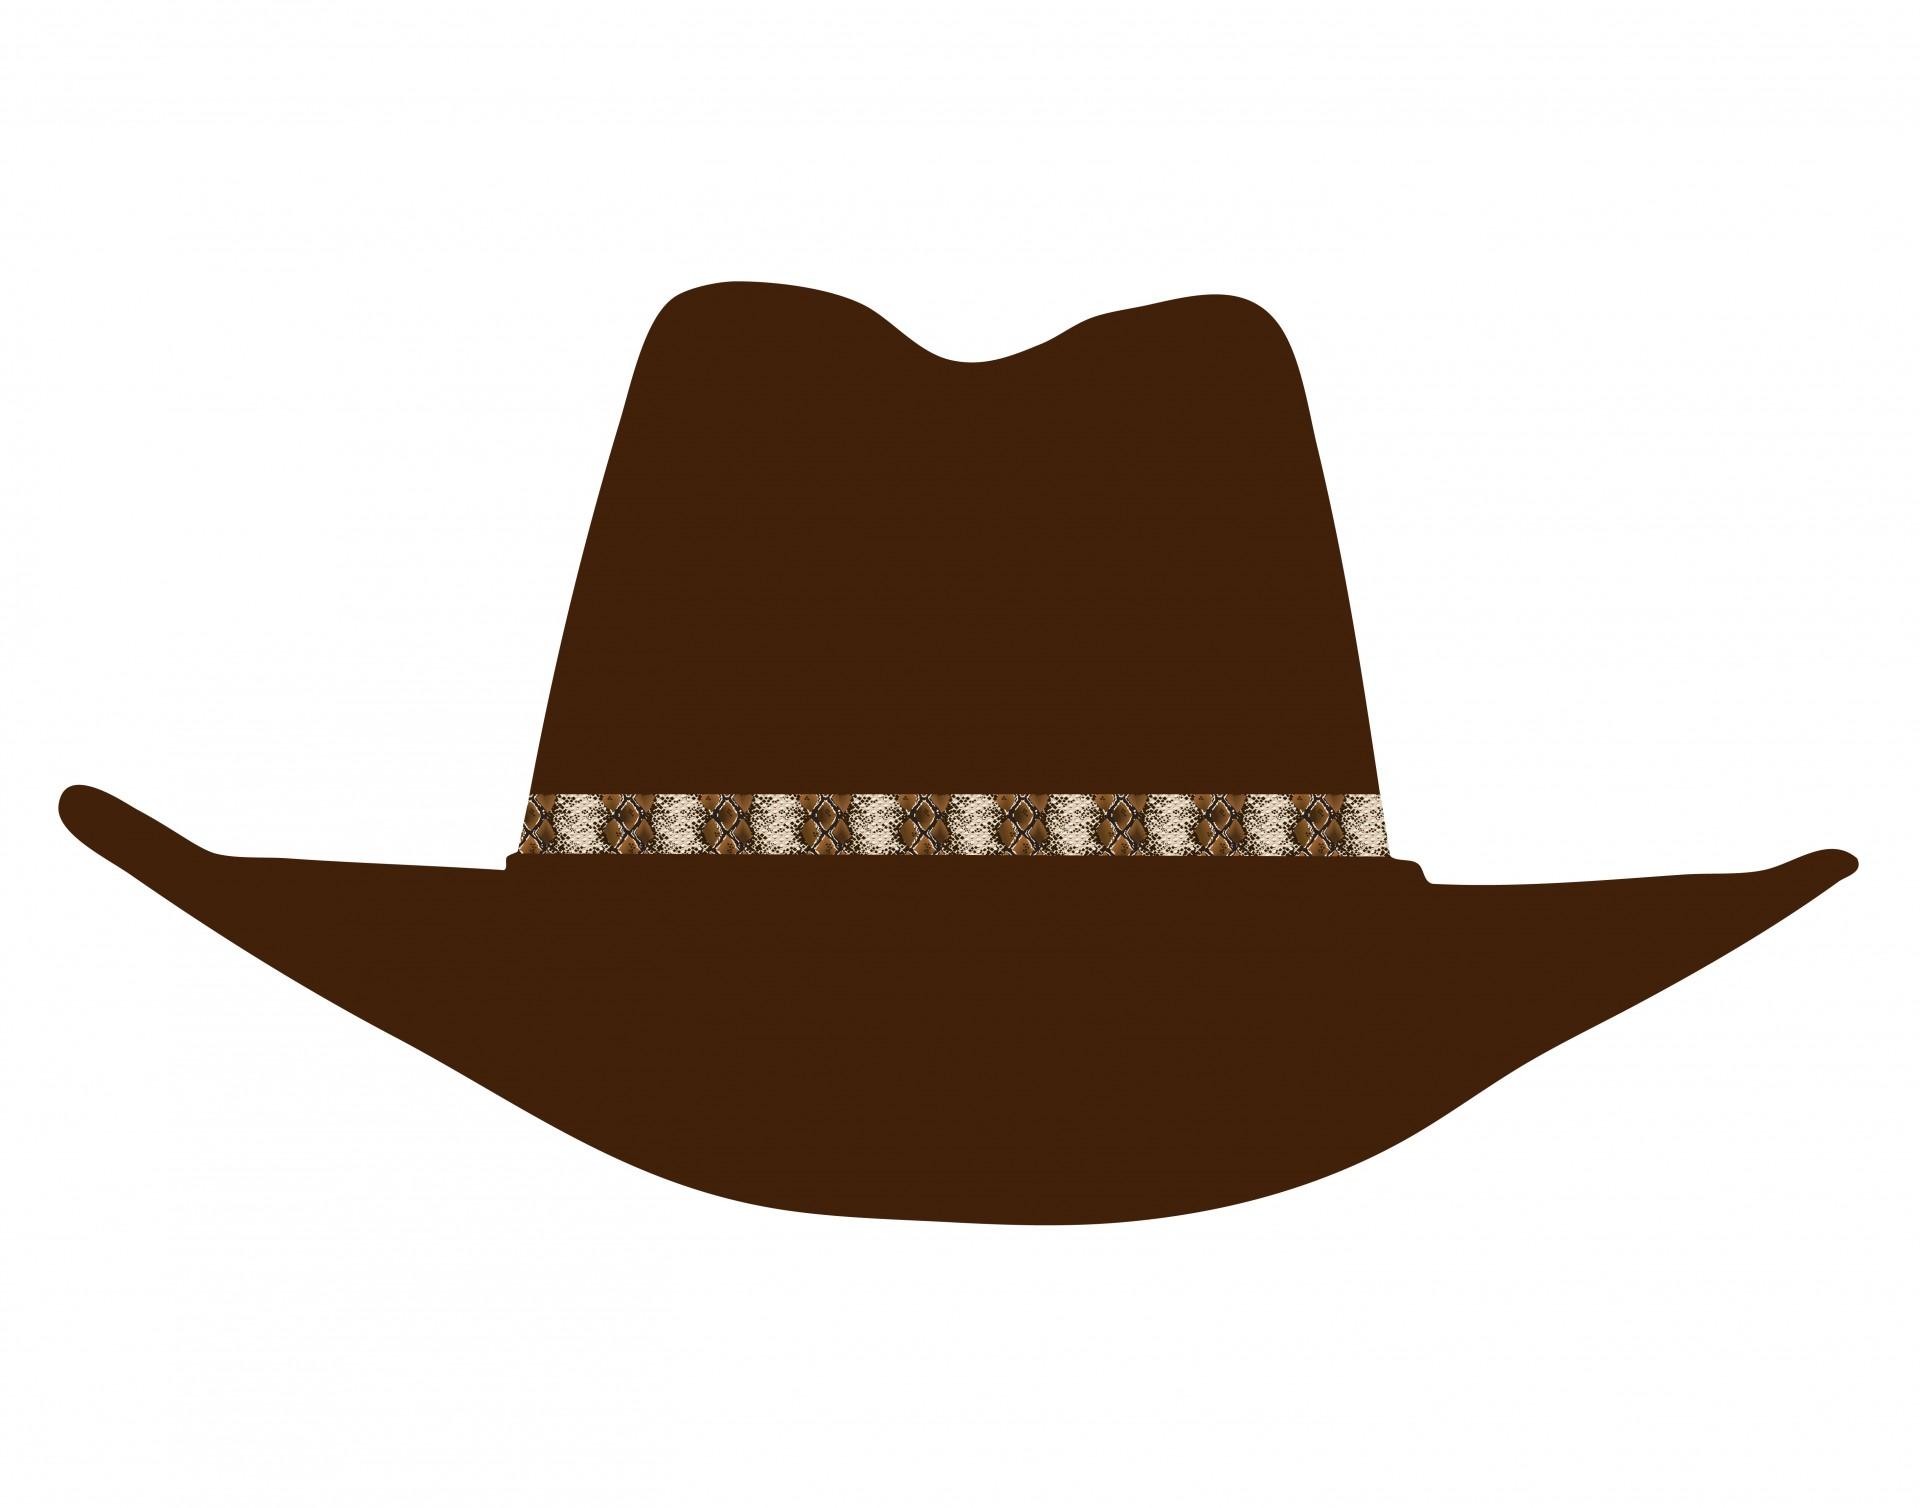 Western cowboy hat clipart jpg download Cowboy Hat Clipart - Clip Art Library jpg download